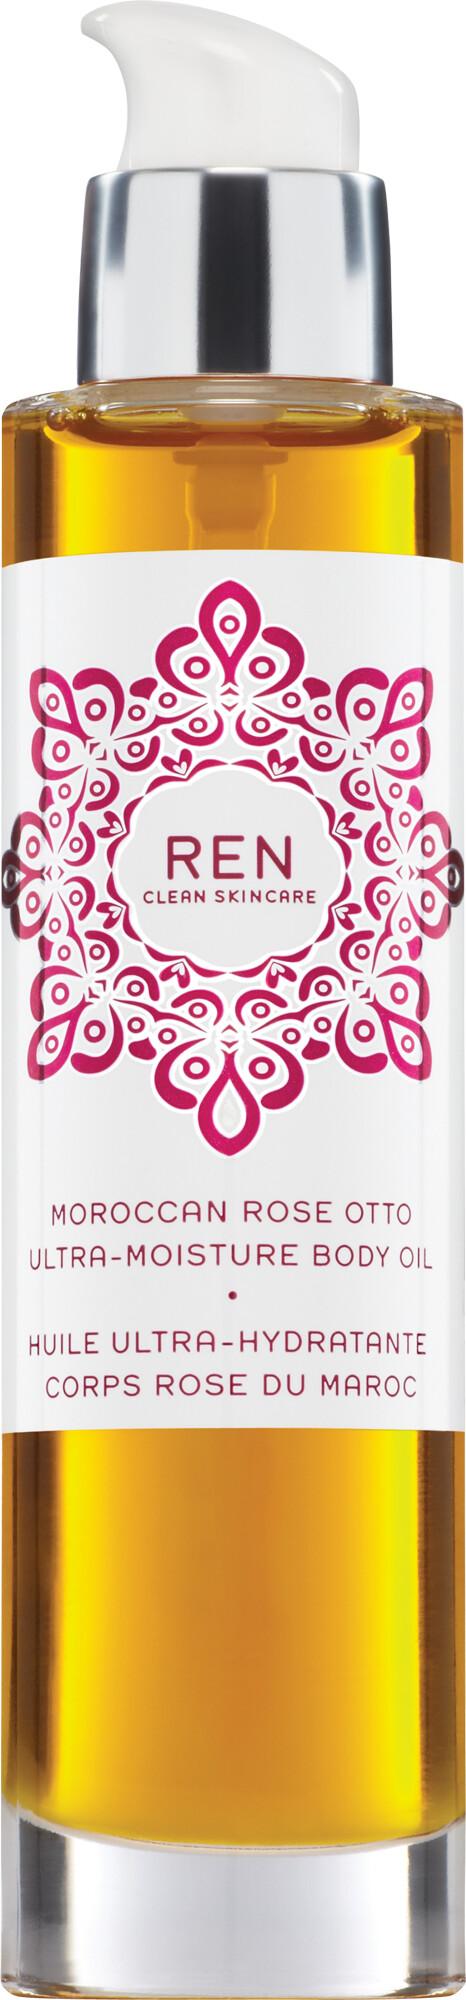 REN Moroccan Rose Otto ULTRA-MOISTURE100ML